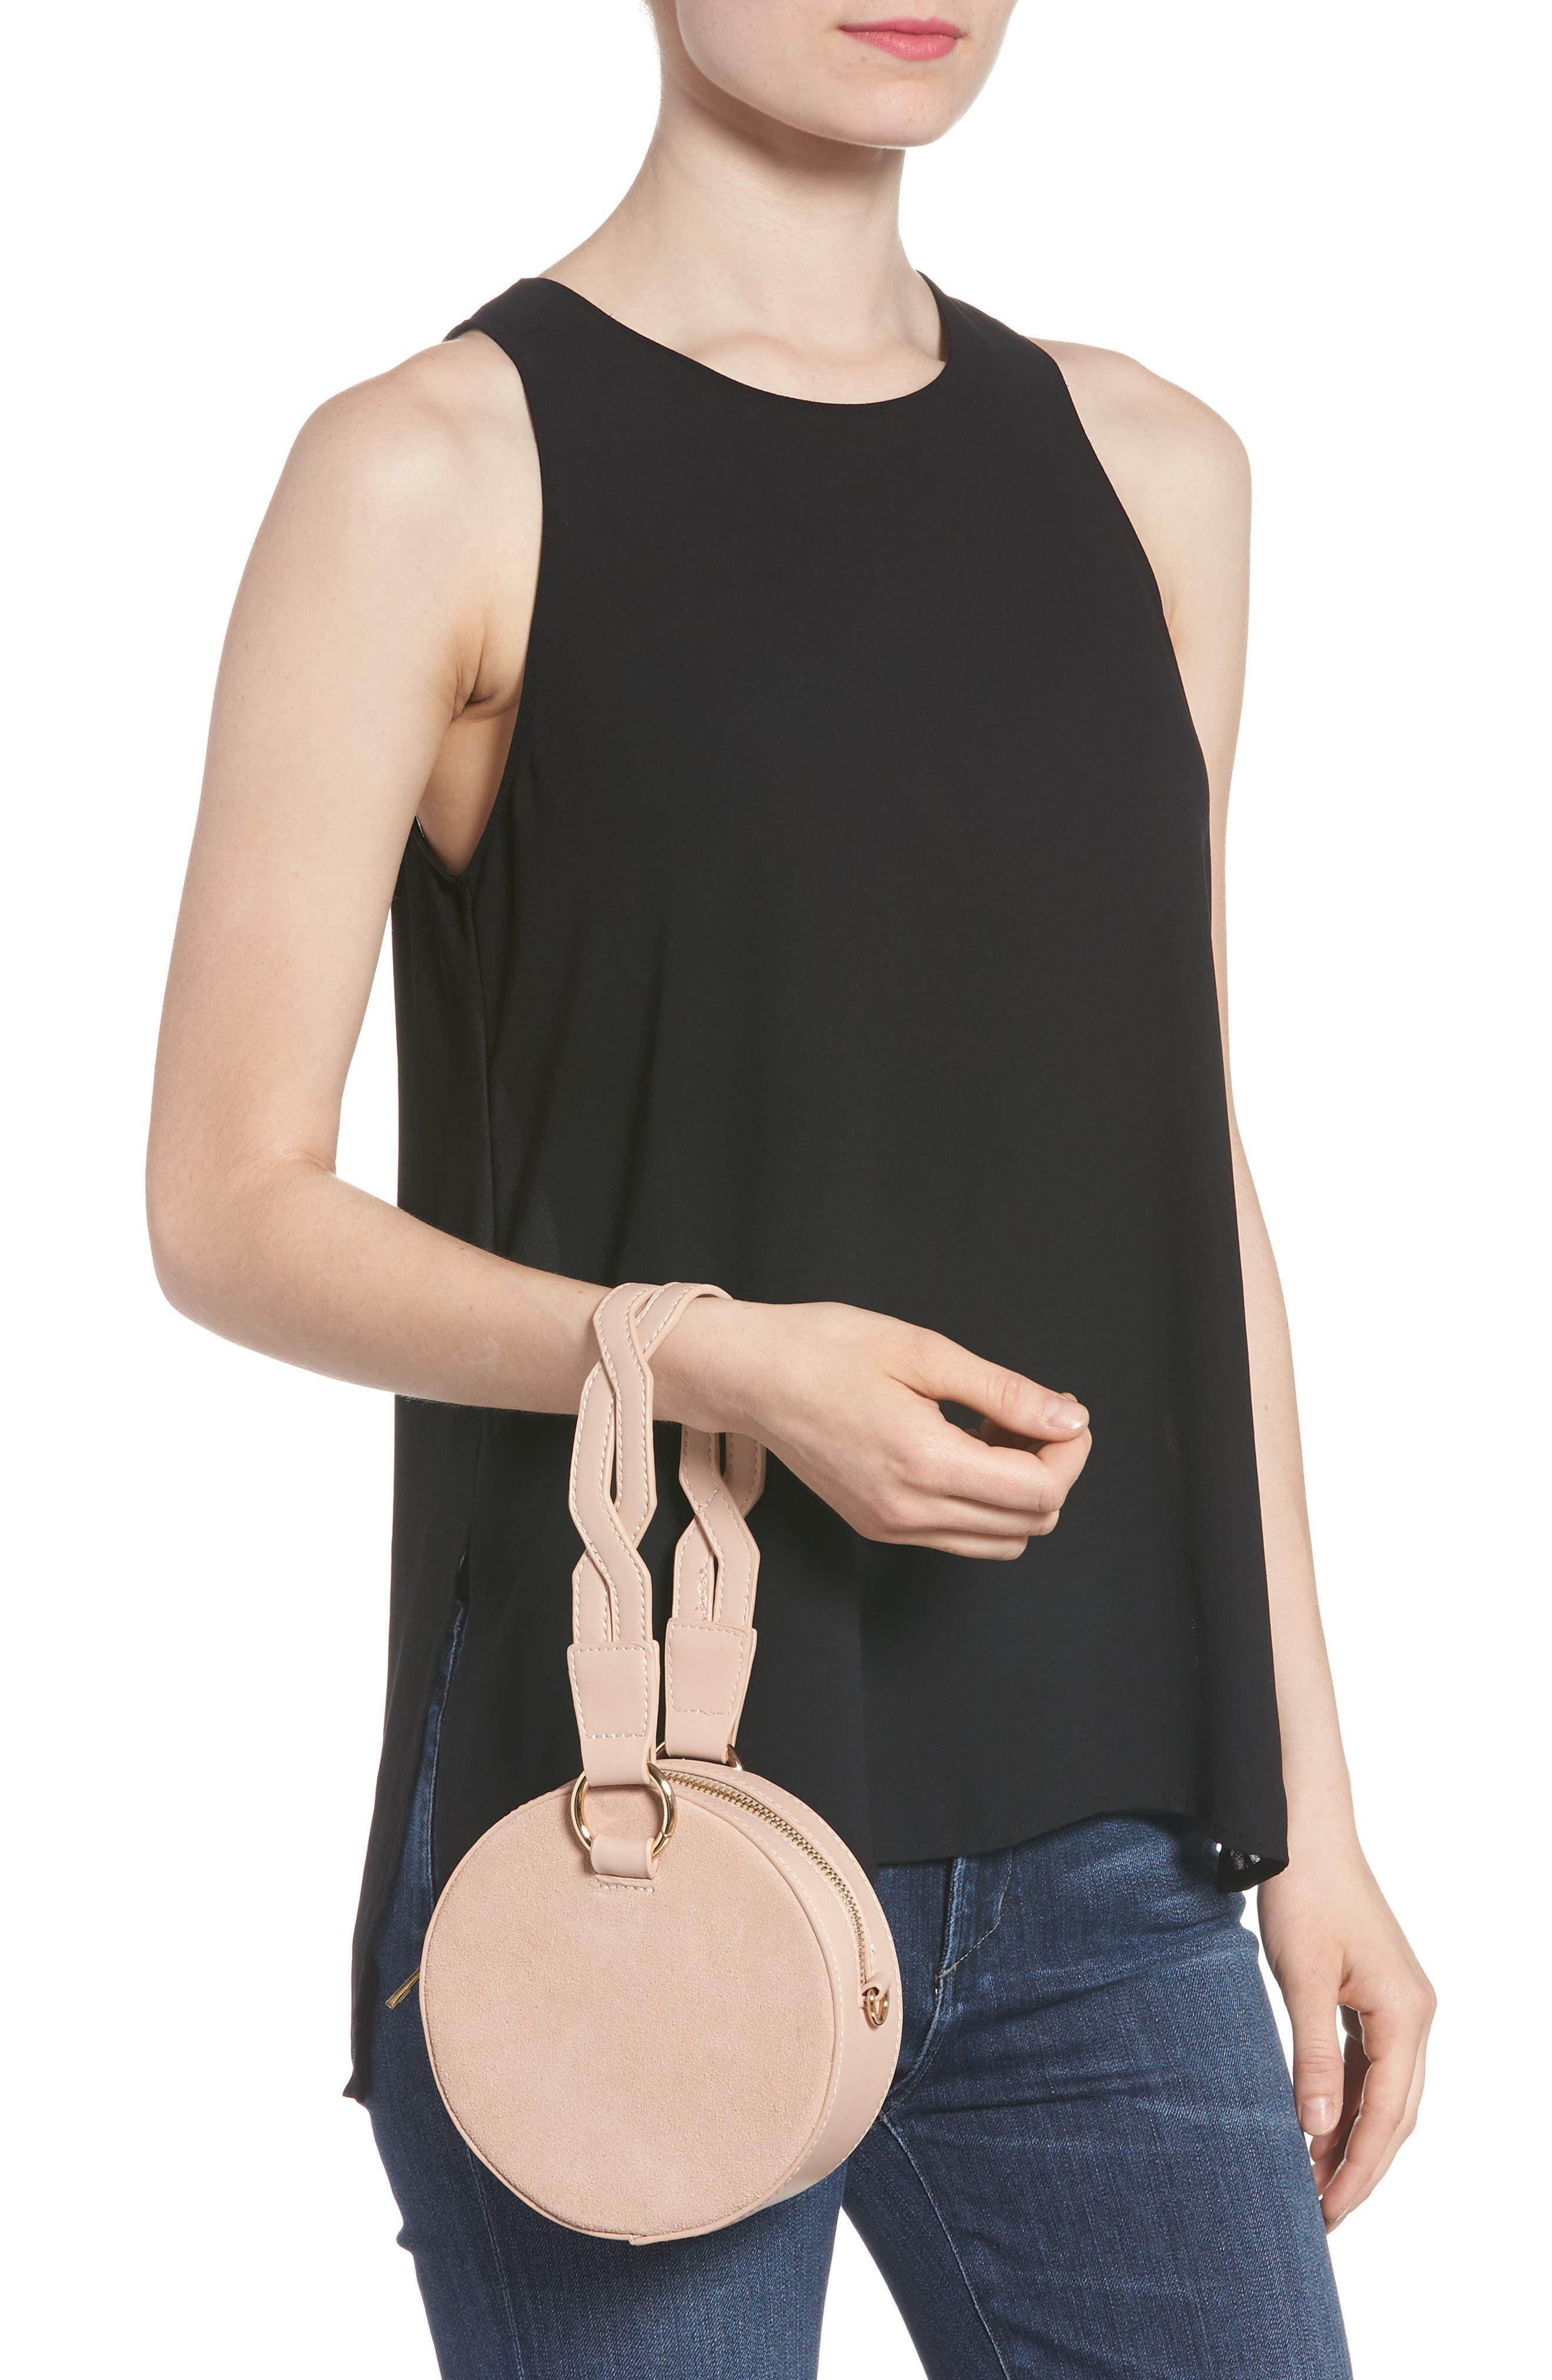 Circle Bag with Wristlet,                             Alternate thumbnail 2, color,                             250